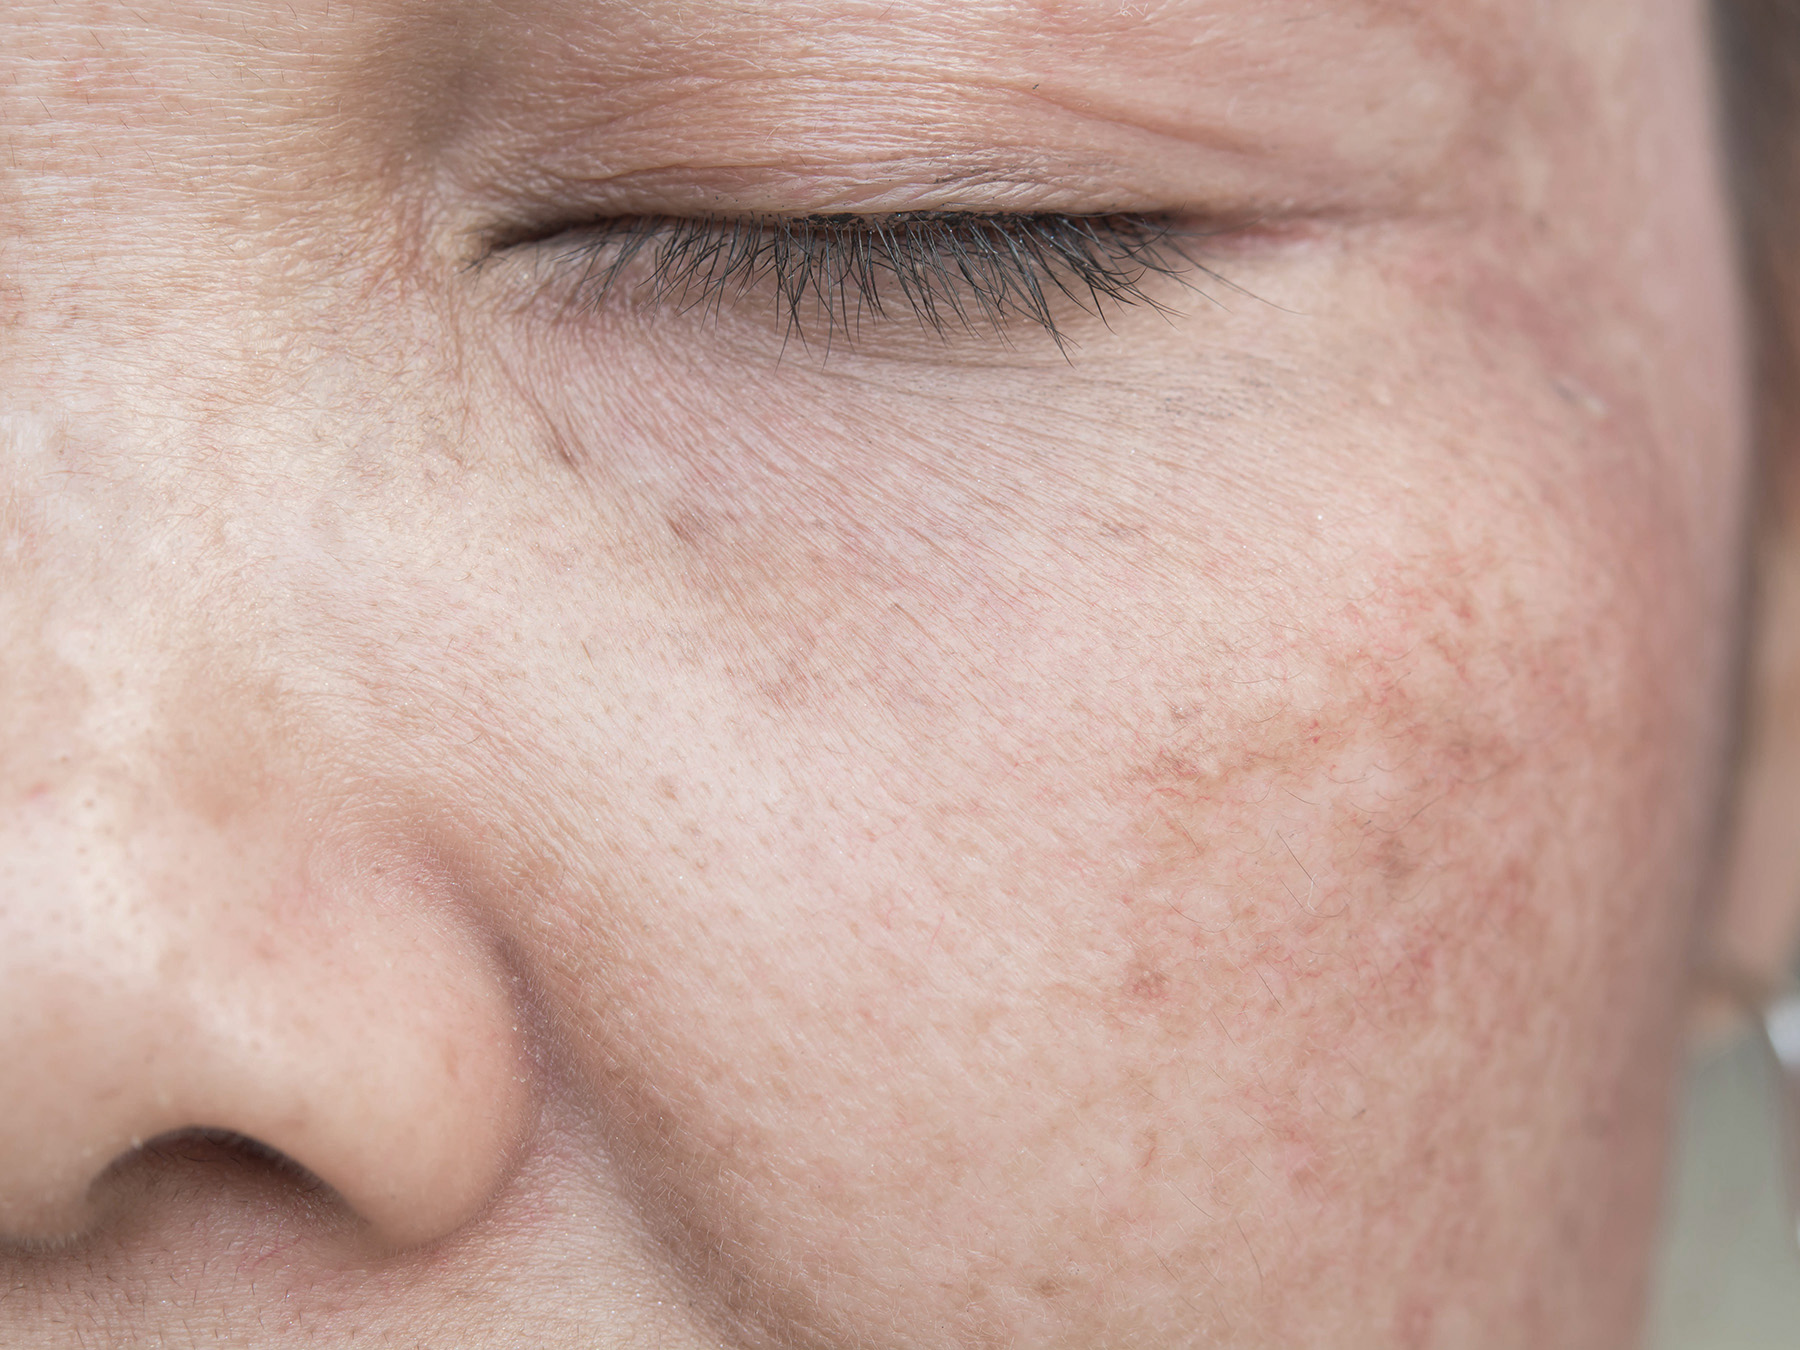 dermatology2.jpg